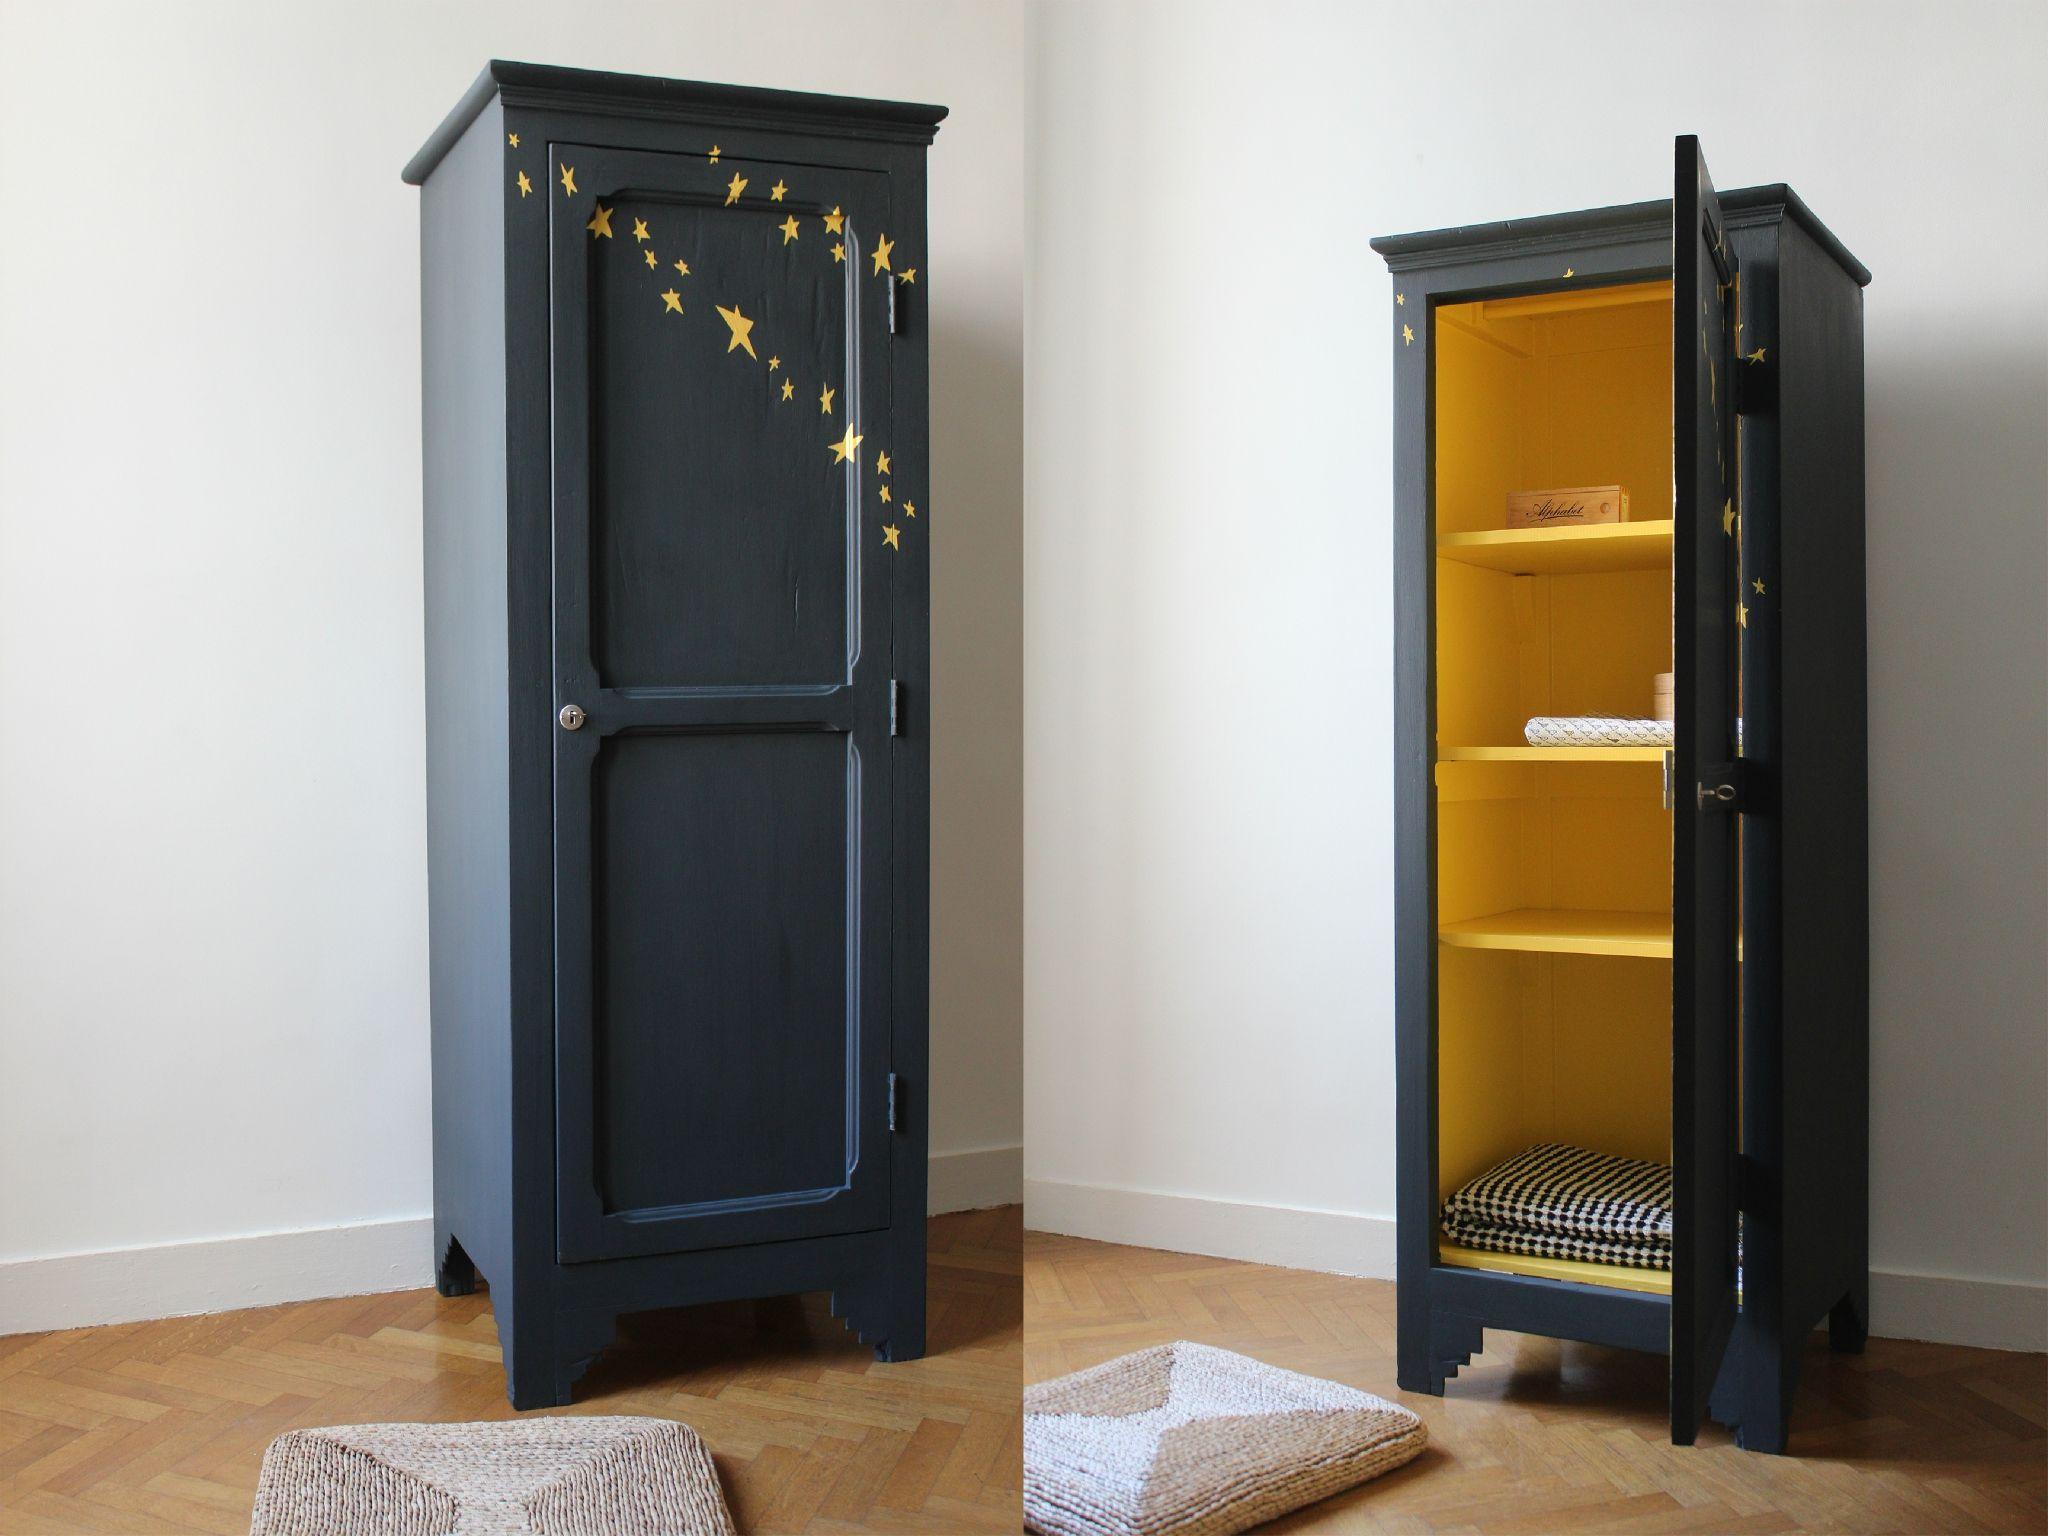 meuble entree penderie petite armoire penderie vintage trendy little 4